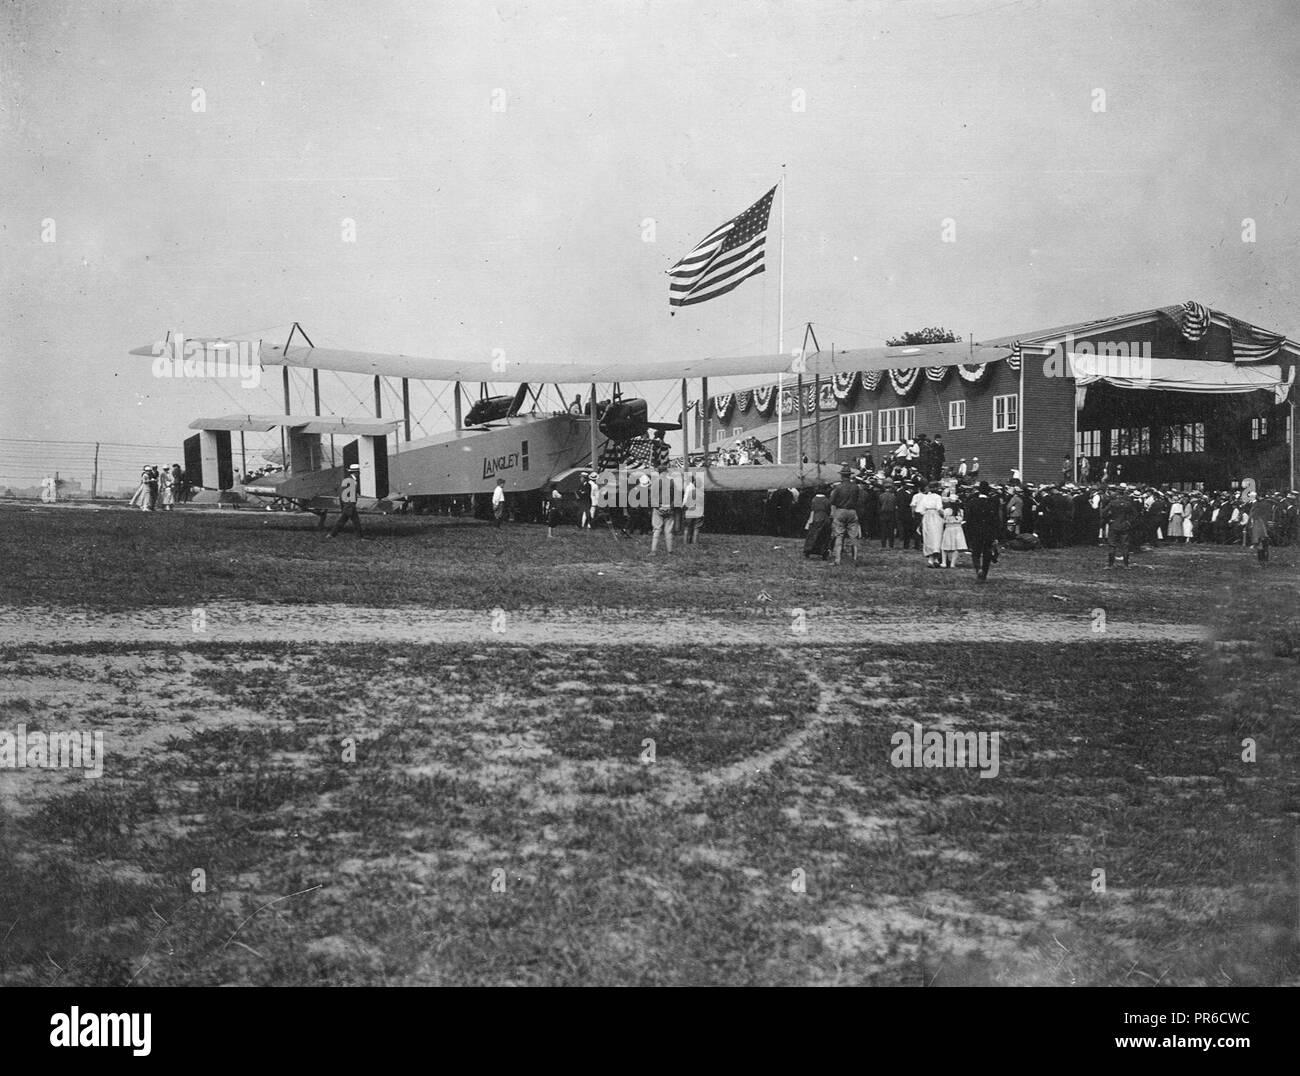 1917-1919  The Handley-Page Aero Langley beside the hangar before her trial trip, Elizabeth, N.J - Stock Image